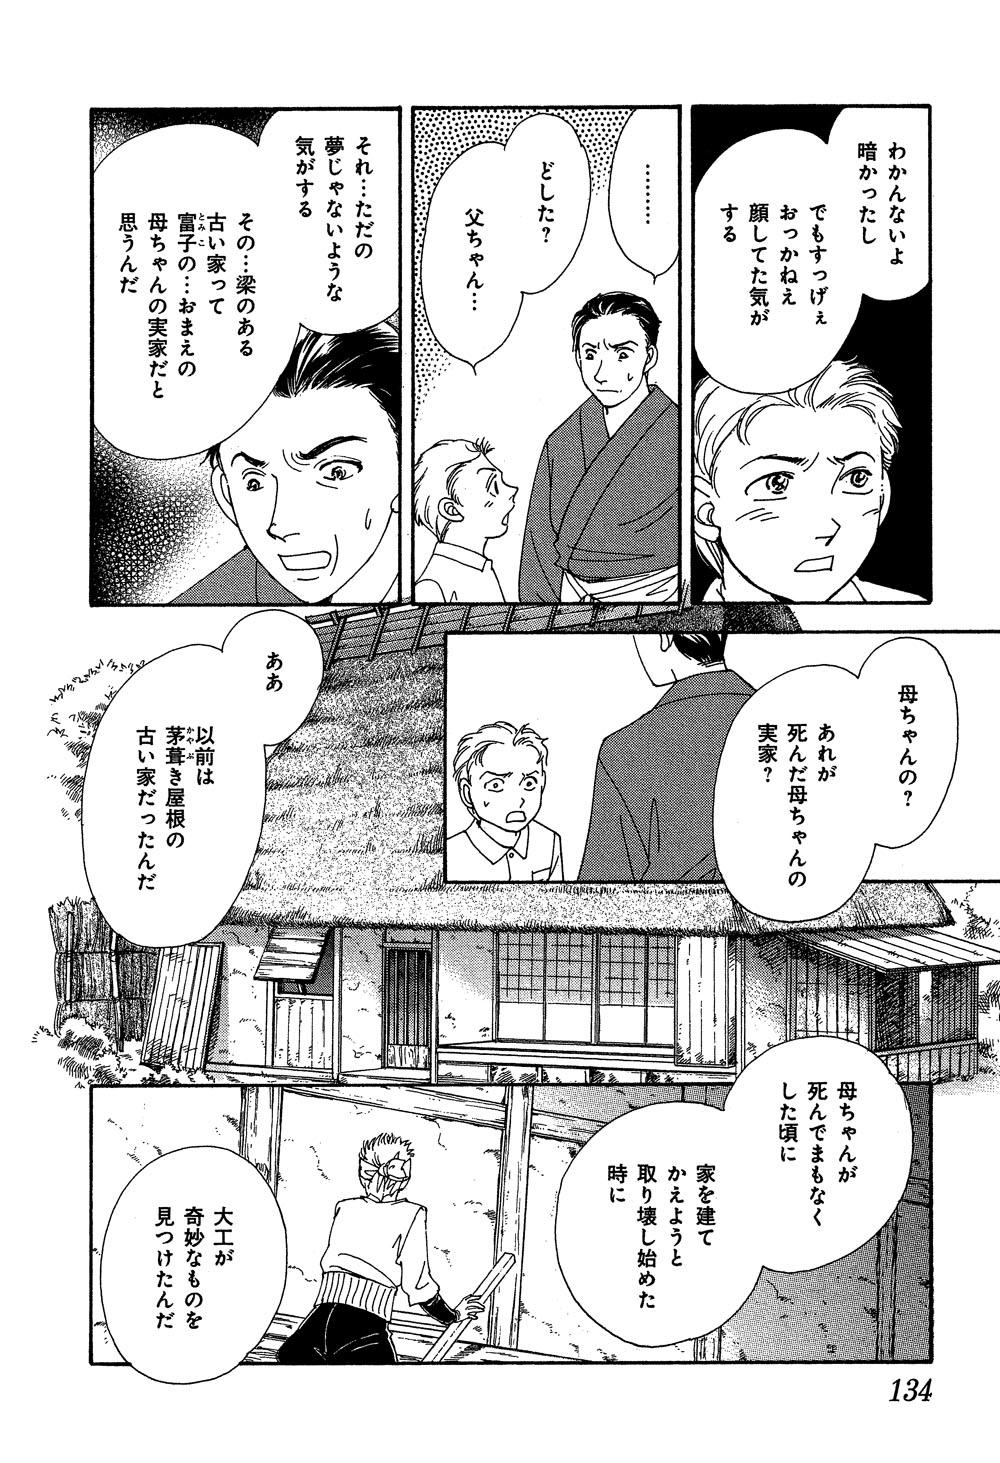 mayuri_0001_0134.jpg